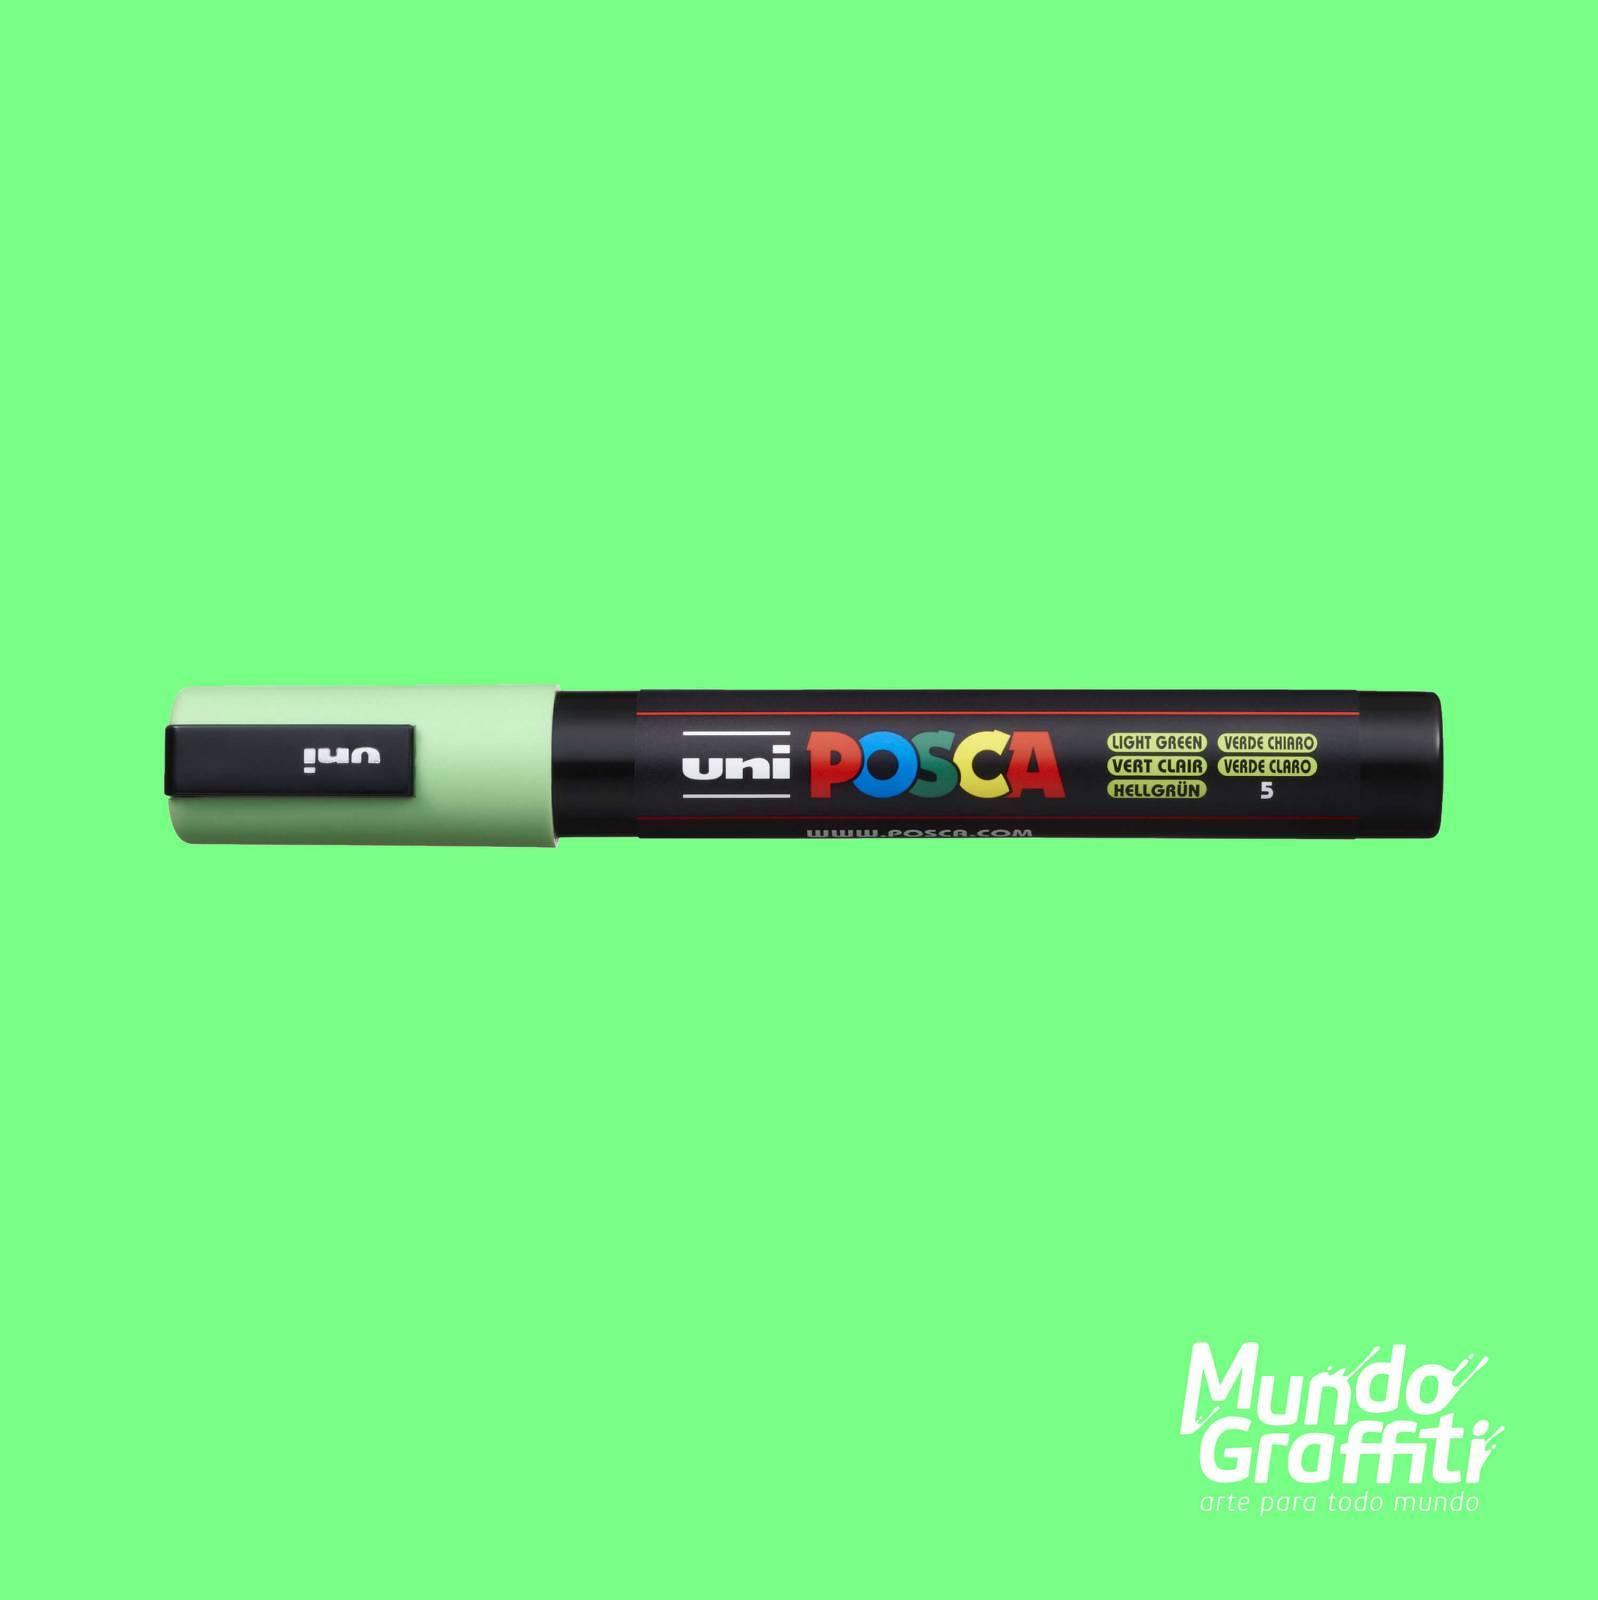 Caneta Posca 5M Verde Claro - Mundo Graffiti